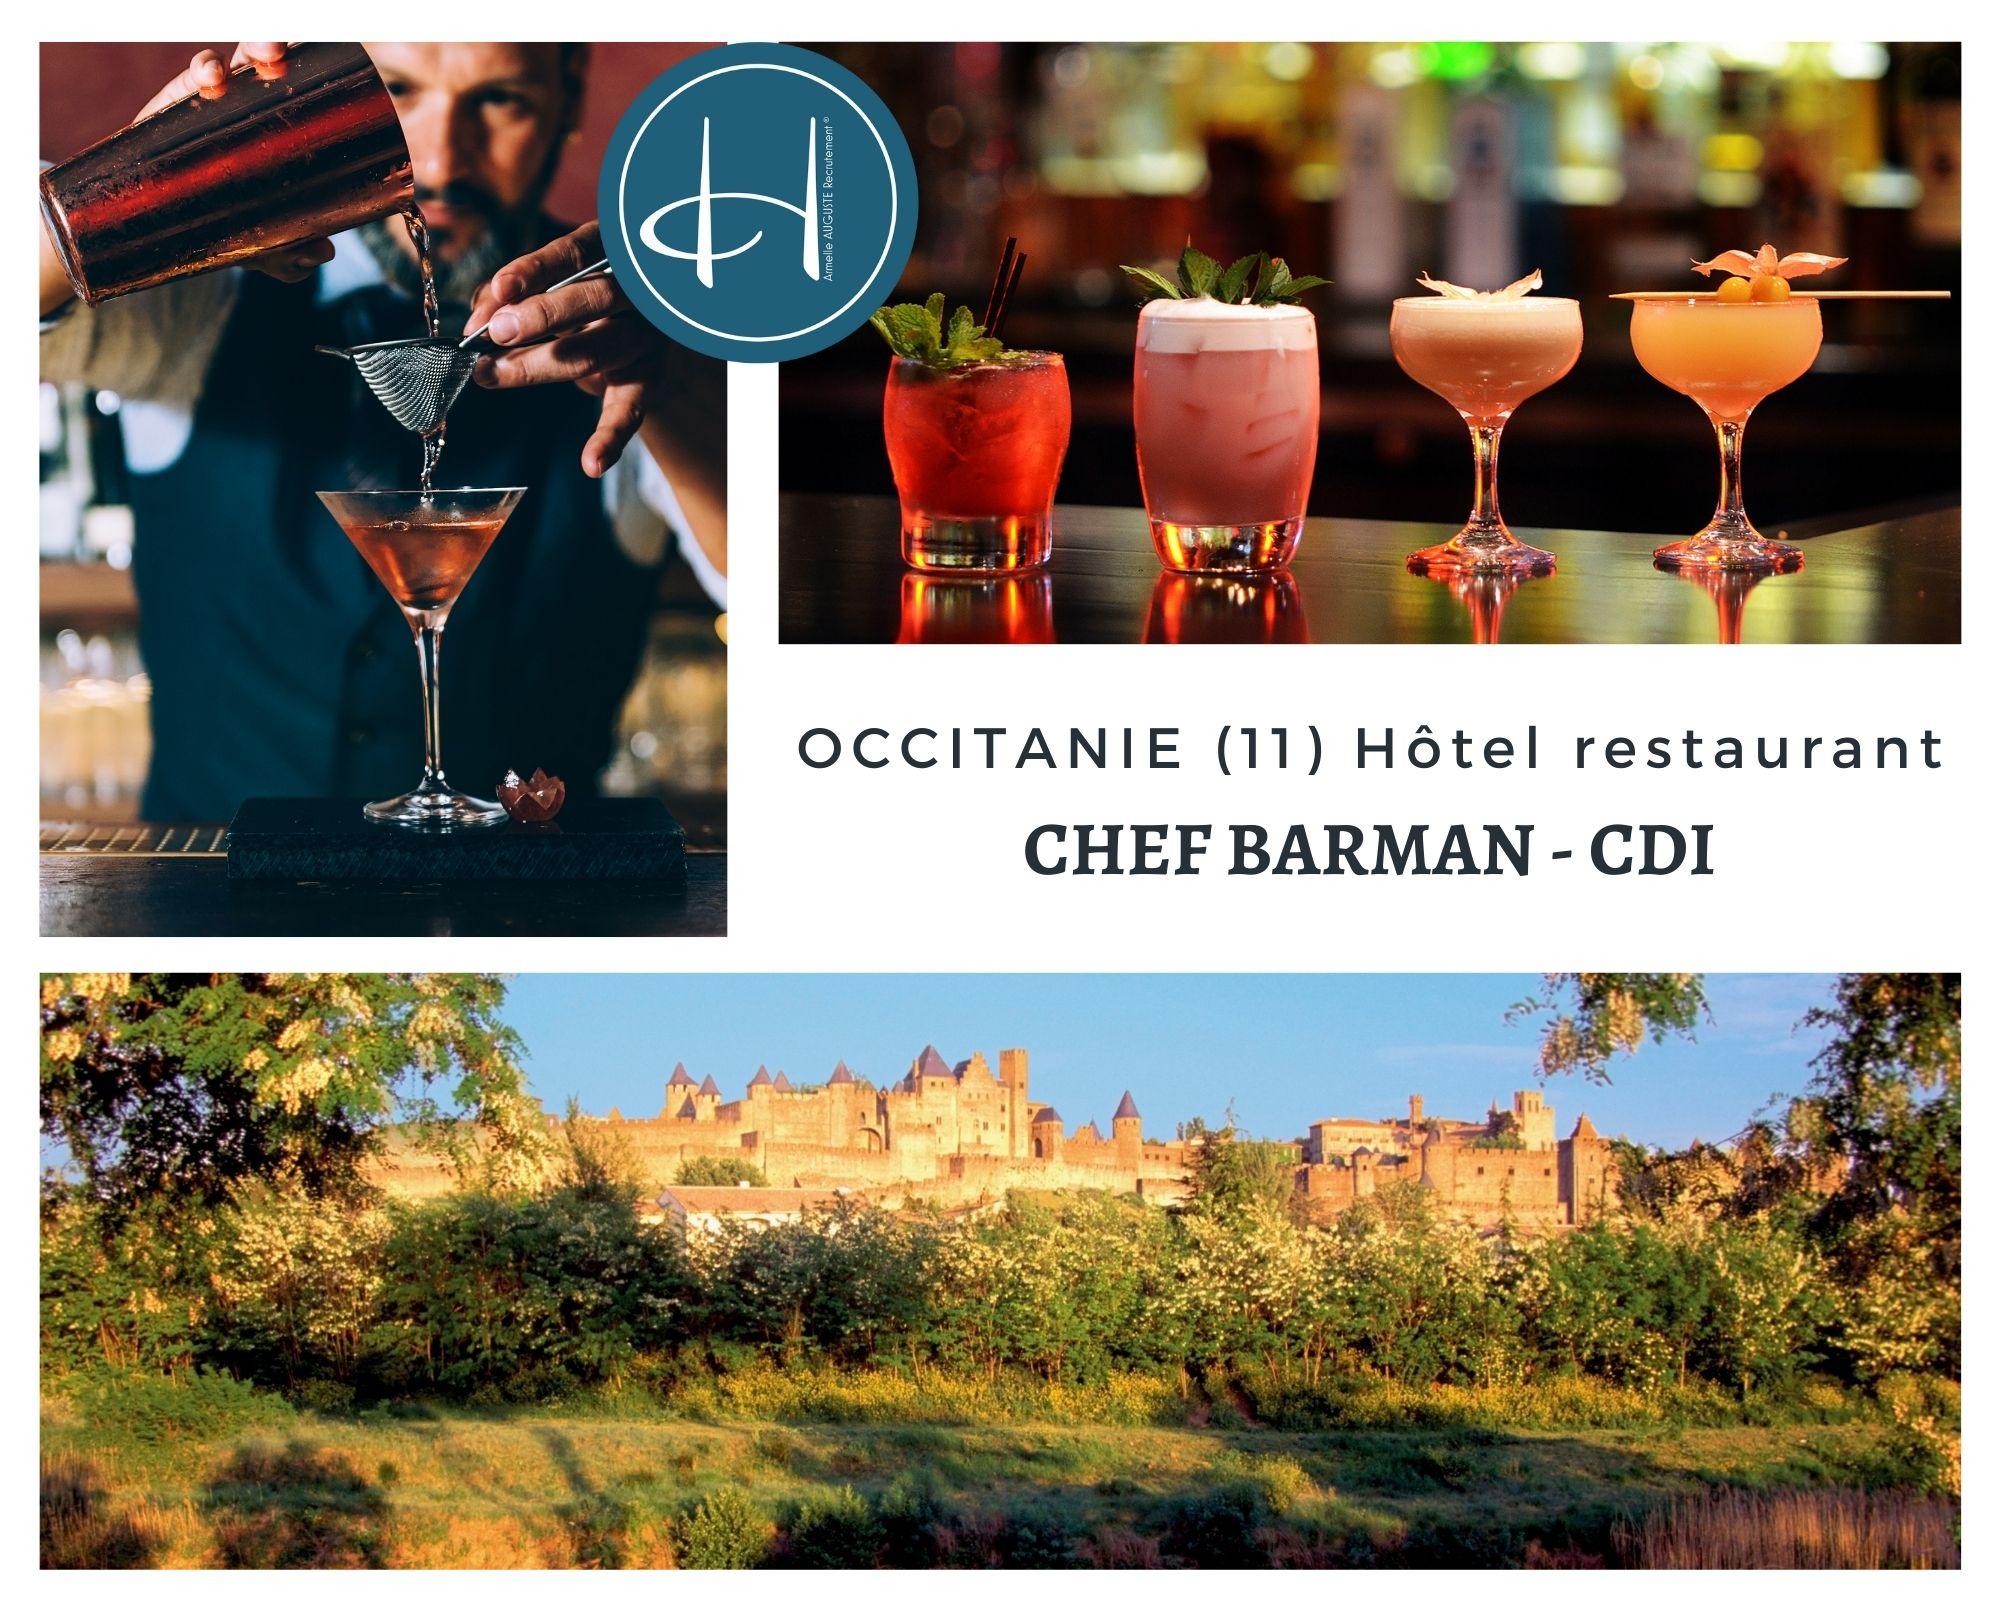 Recrutement: Chef Barman F/H chez Armelle AUGUSTE Recrutement® à Castelnaudary